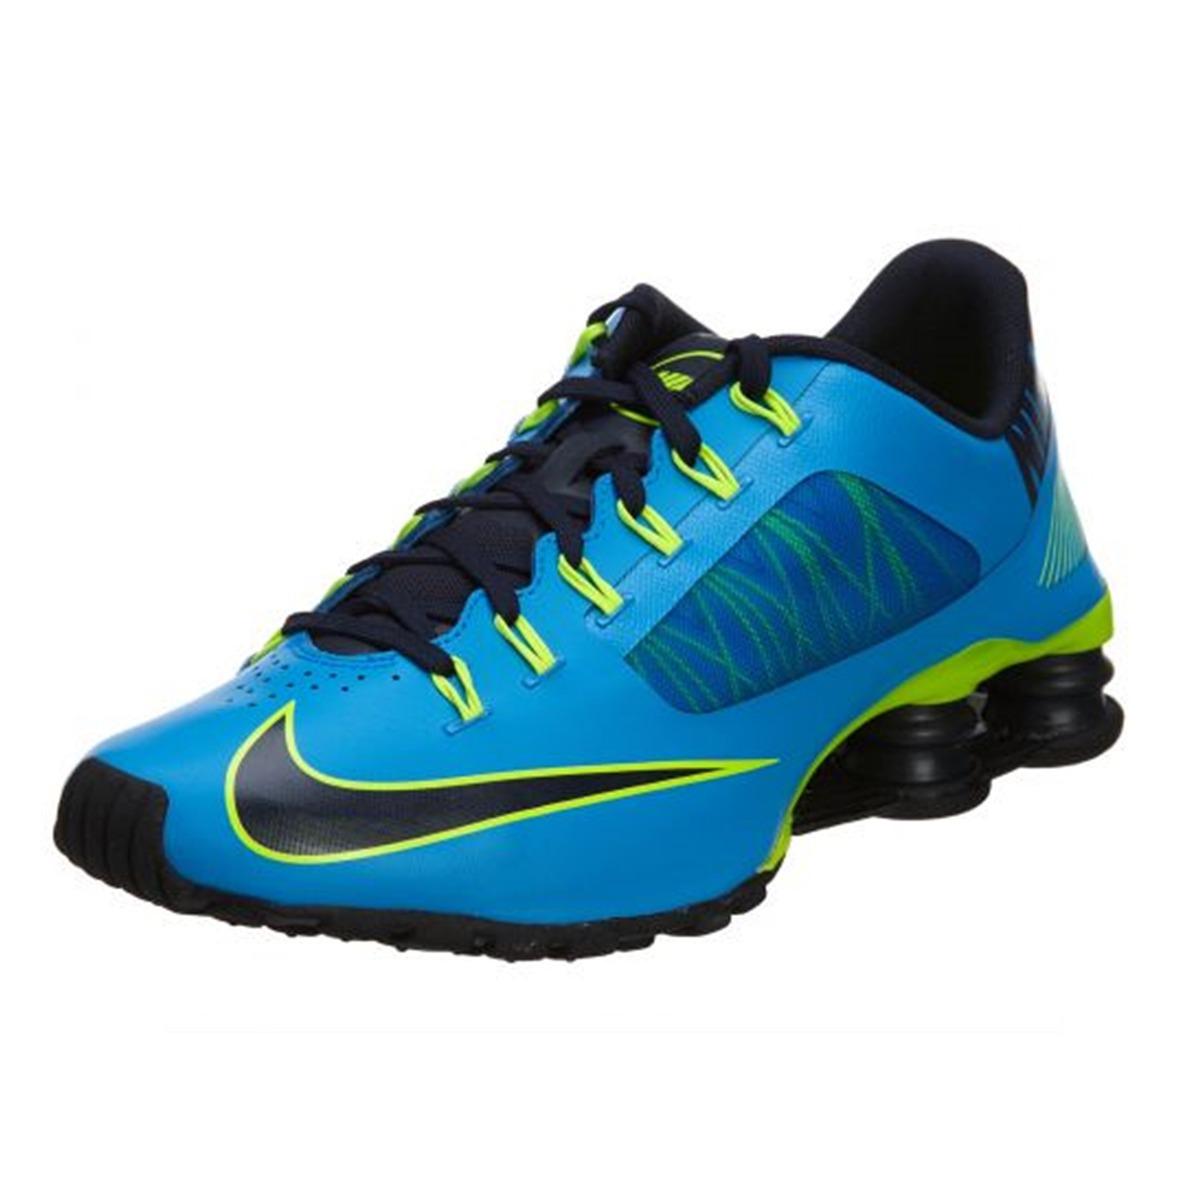 Tenis Nike Shox Superfly R4 Para Hombre